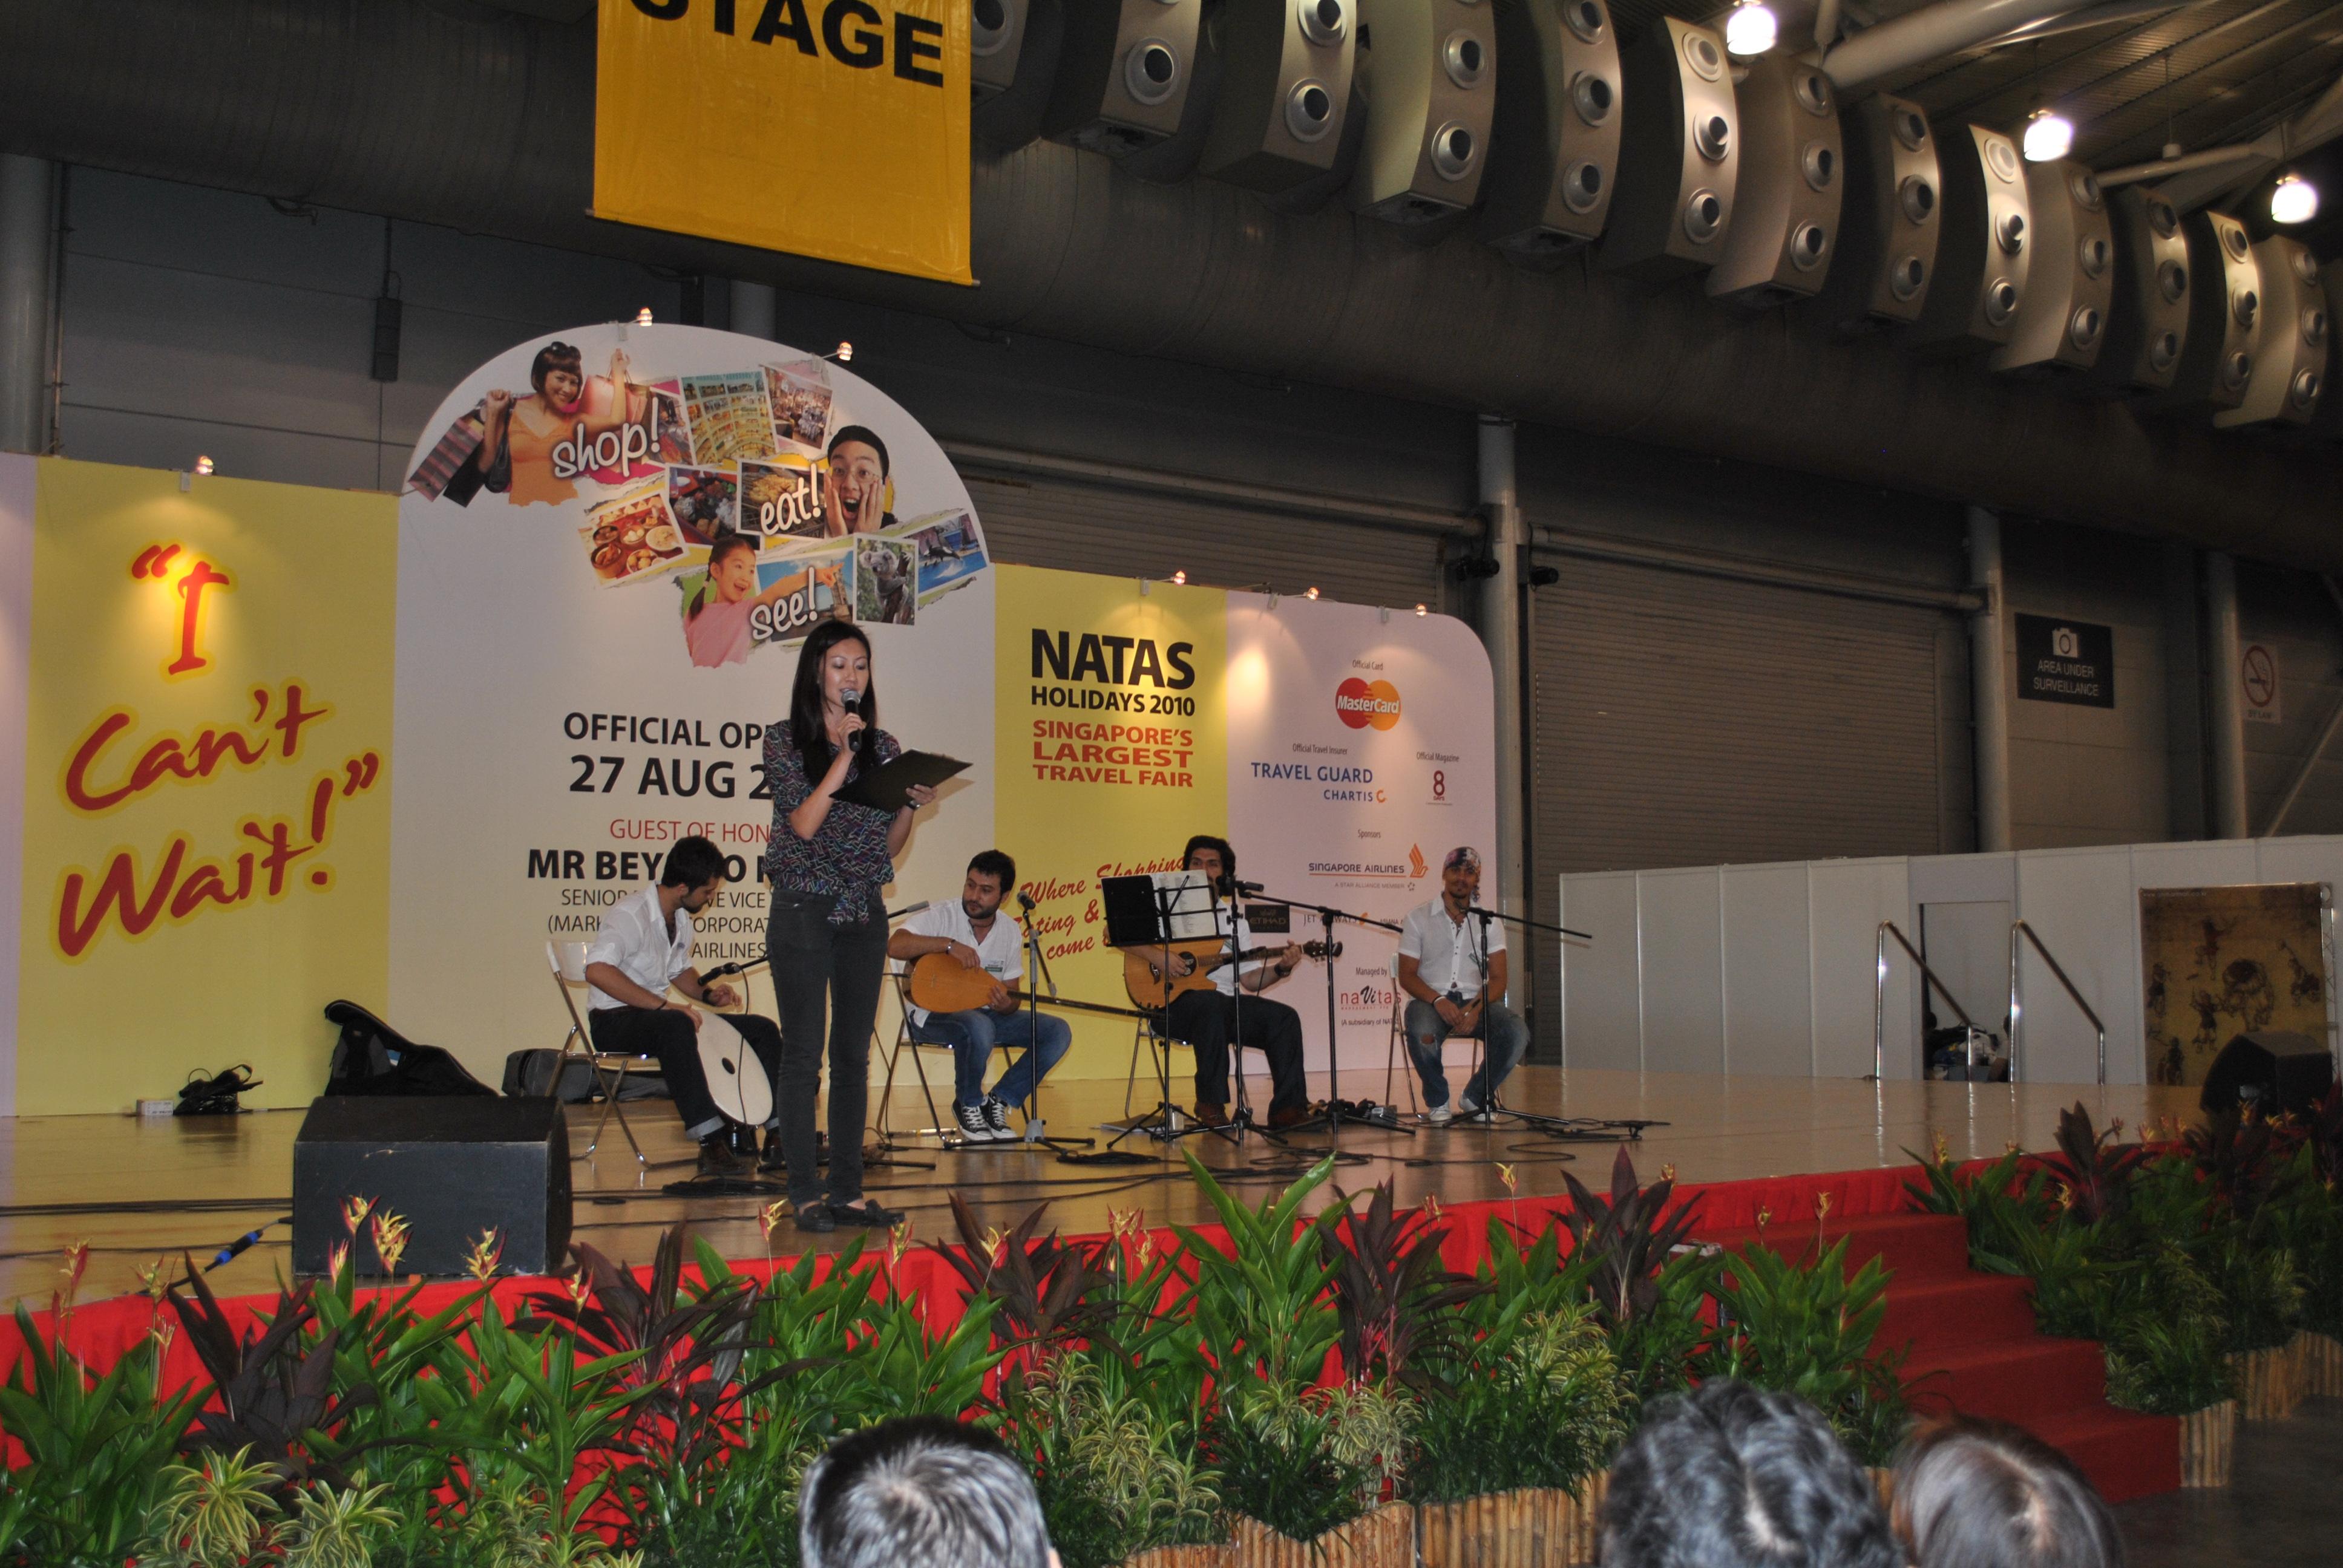 Singapur Festival 2010